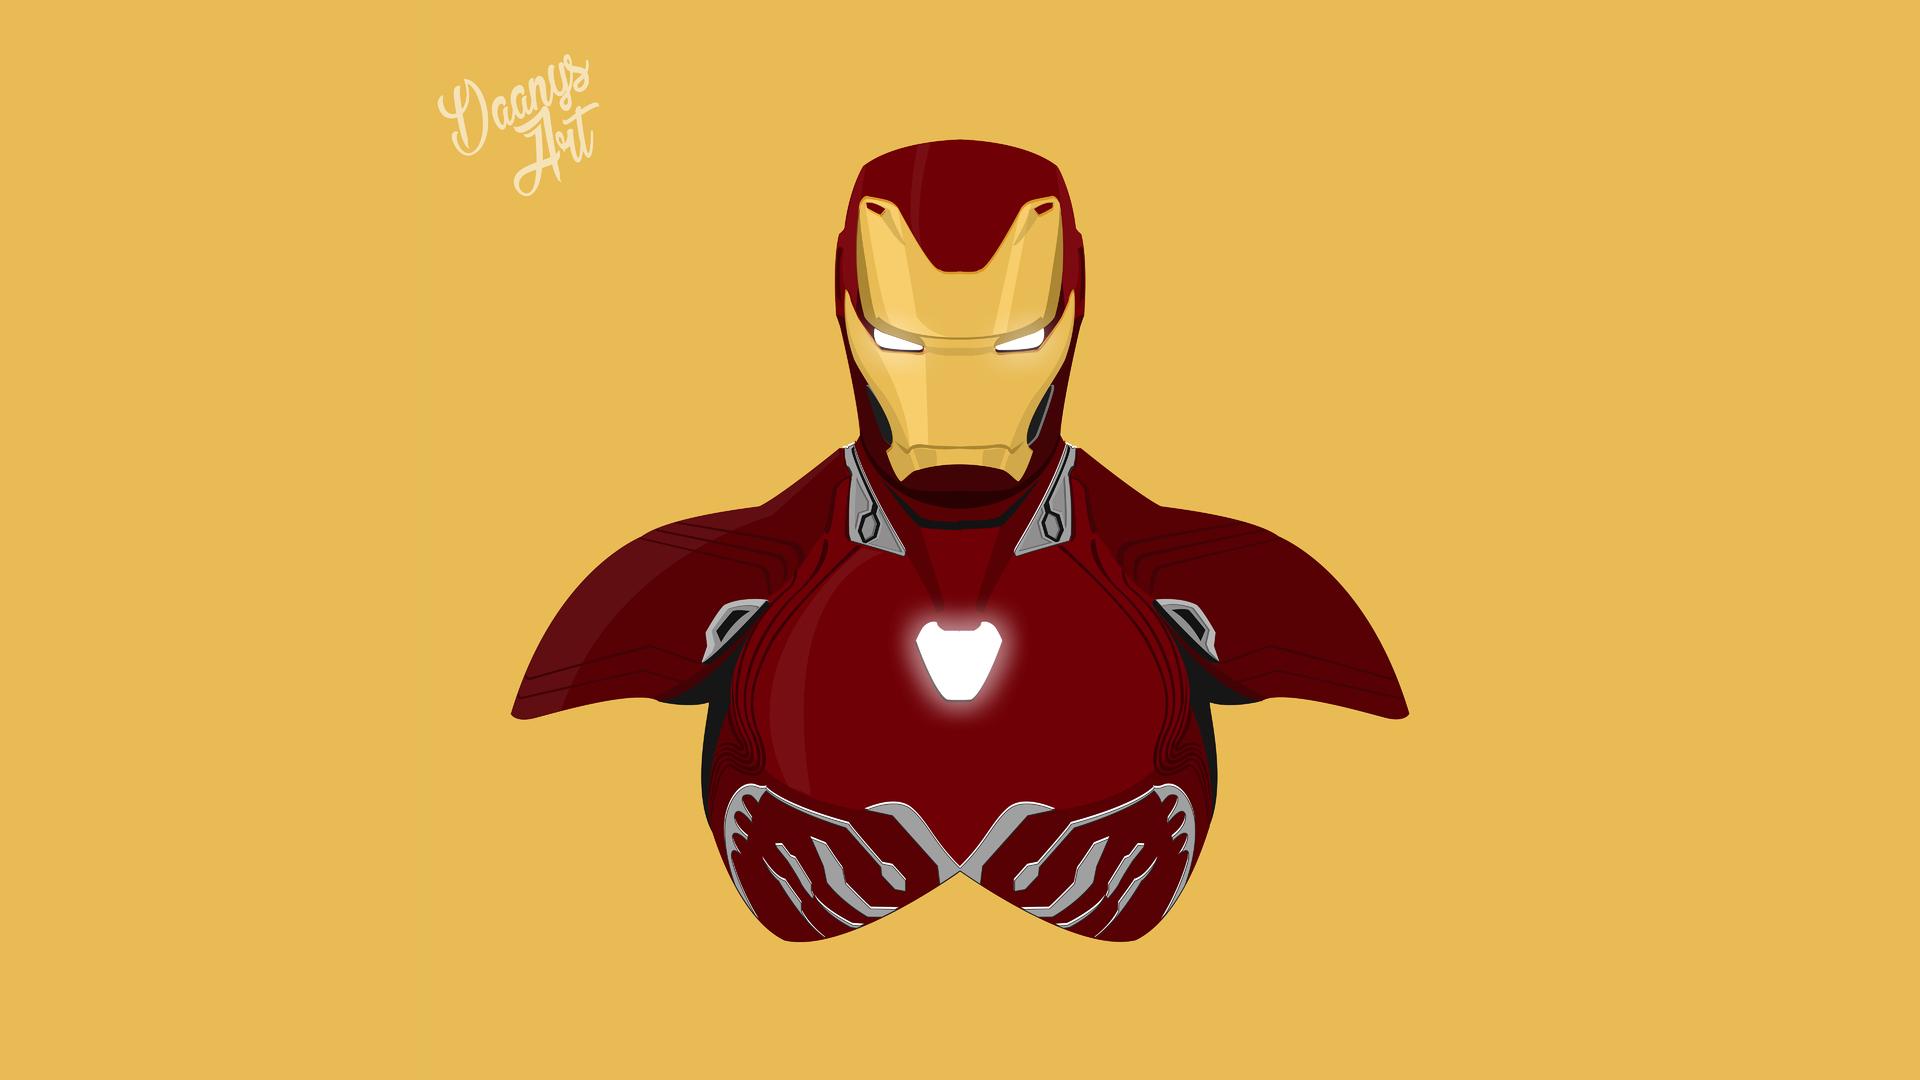 1920x1080 Iron Man Avengers Infinity War 2018 Minimalism 8k Laptop